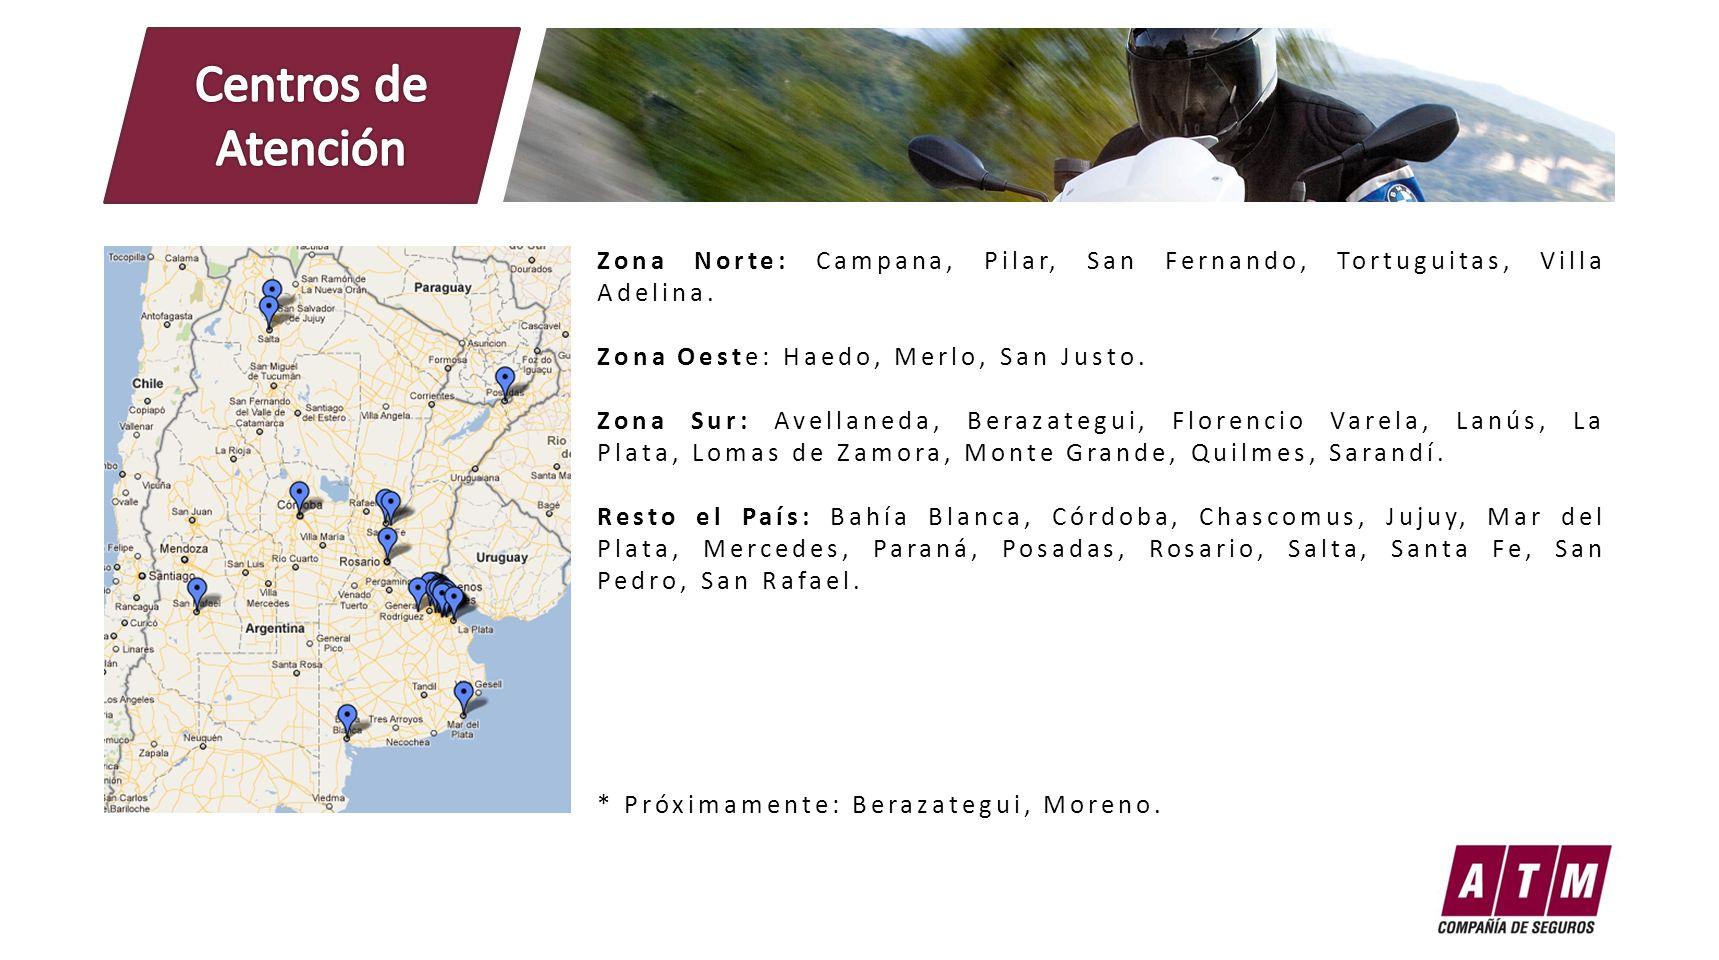 Zona Norte: Campana, Pilar, San Fernando, Tortuguitas, Villa Adelina. Zona Oeste: Haedo, Merlo, San Justo. Zona Sur: Avellaneda, Berazategui, Florenci